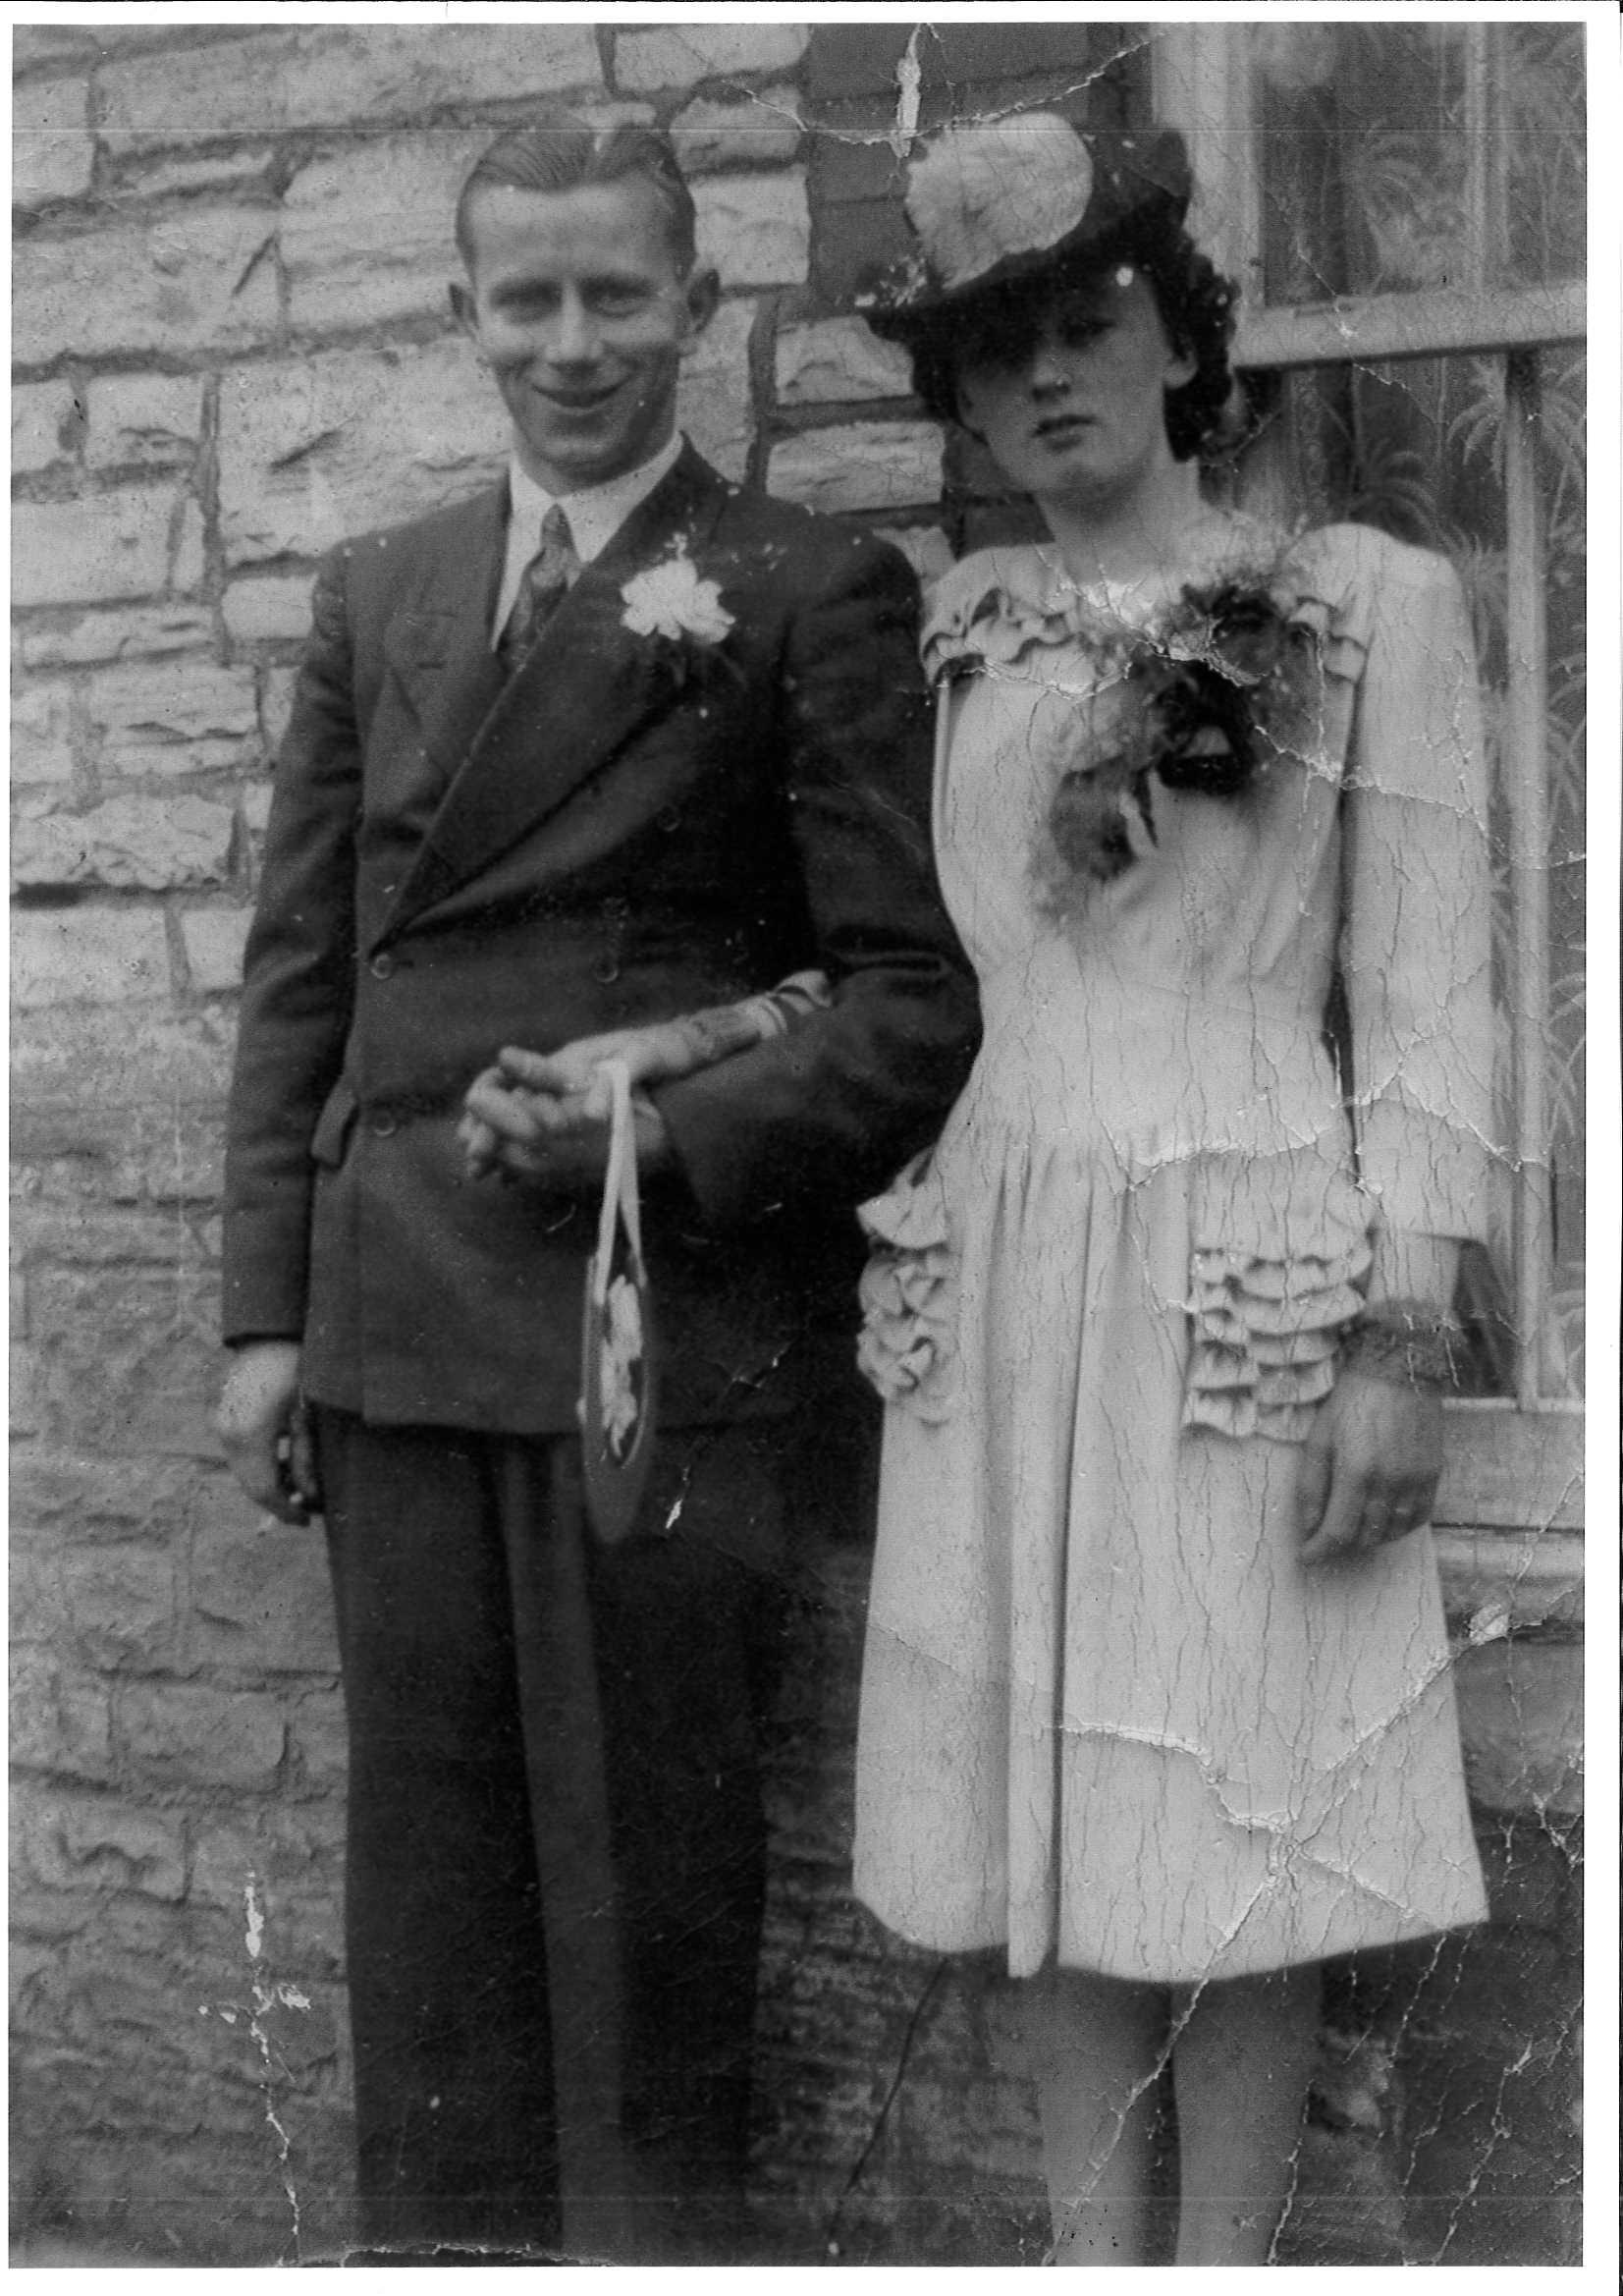 Nan and Grandad Wedding Photo.jpg